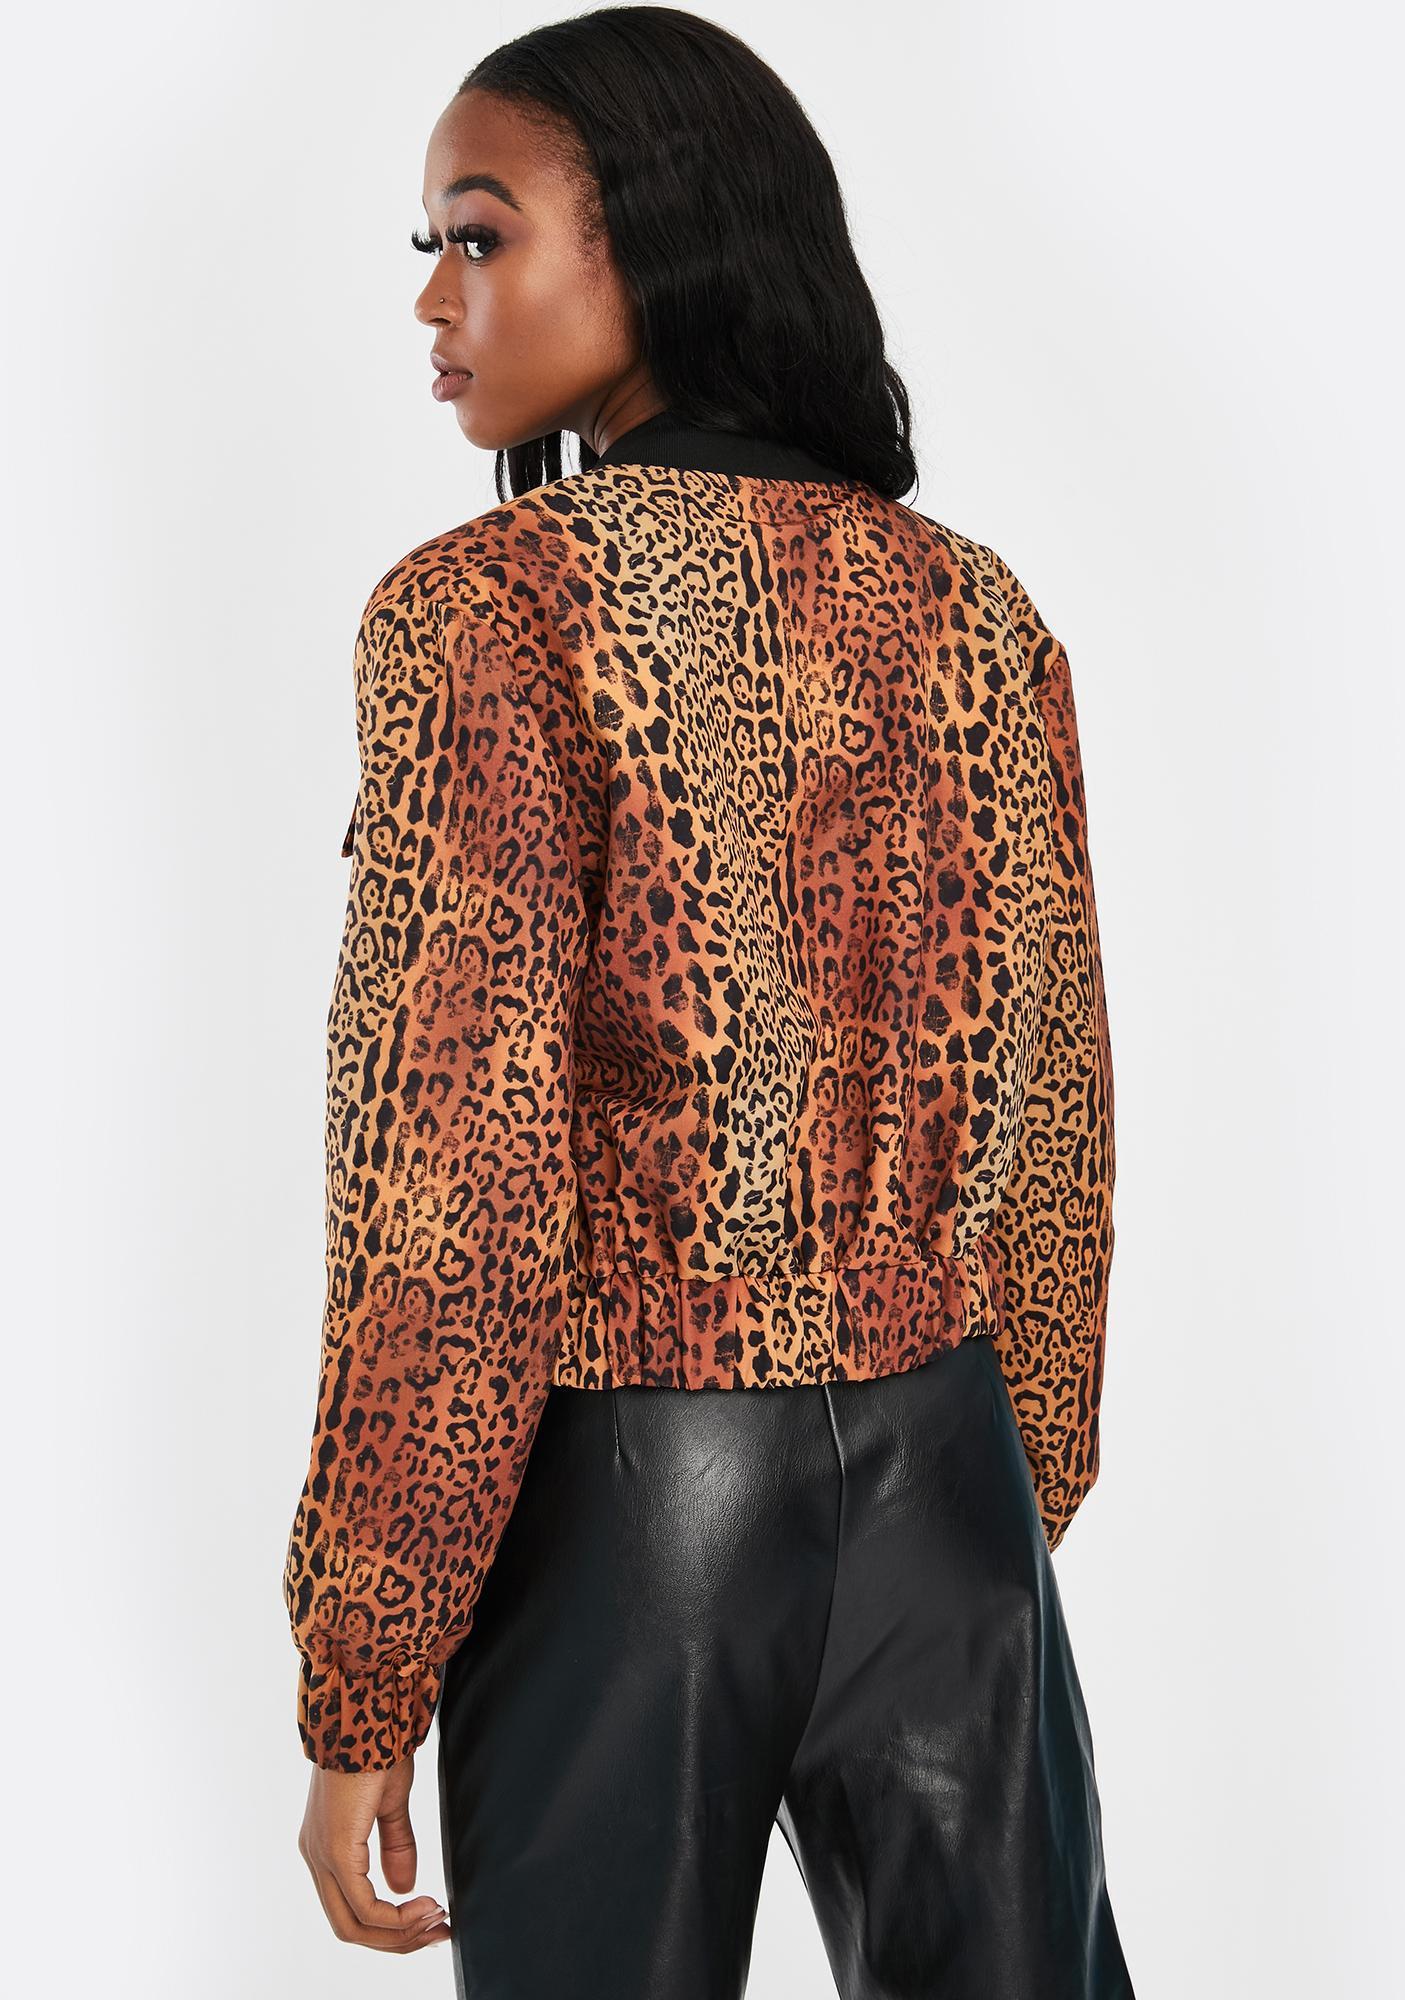 Nana Judy Skyla Leopard Bomber Jacket